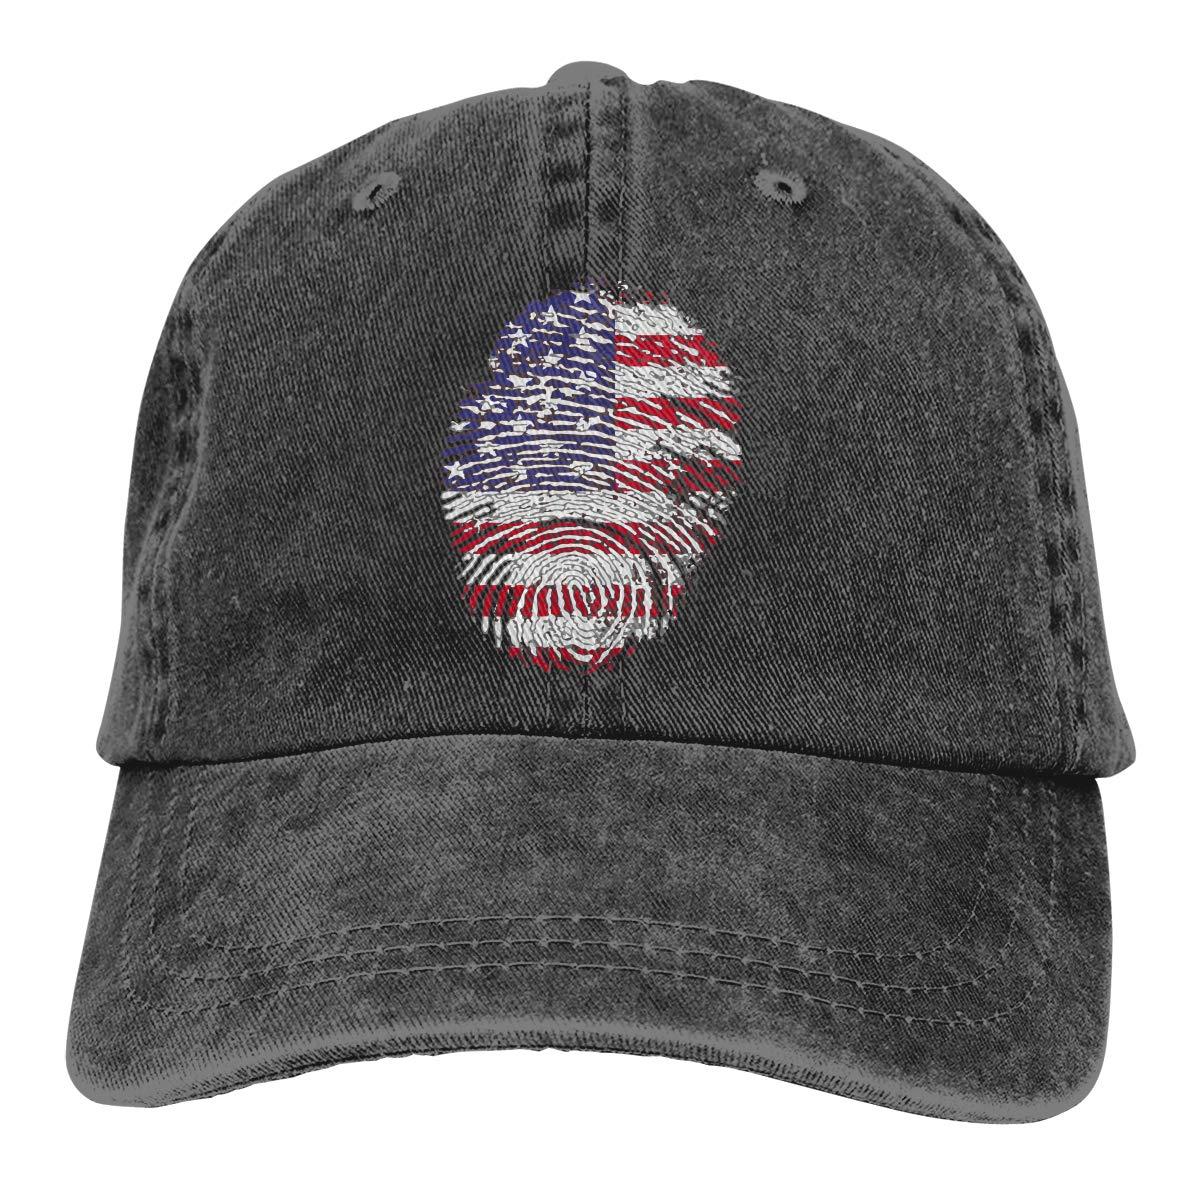 United States Unisex Custom Cowboy Hat Casquette Adjustable Baseball Cap